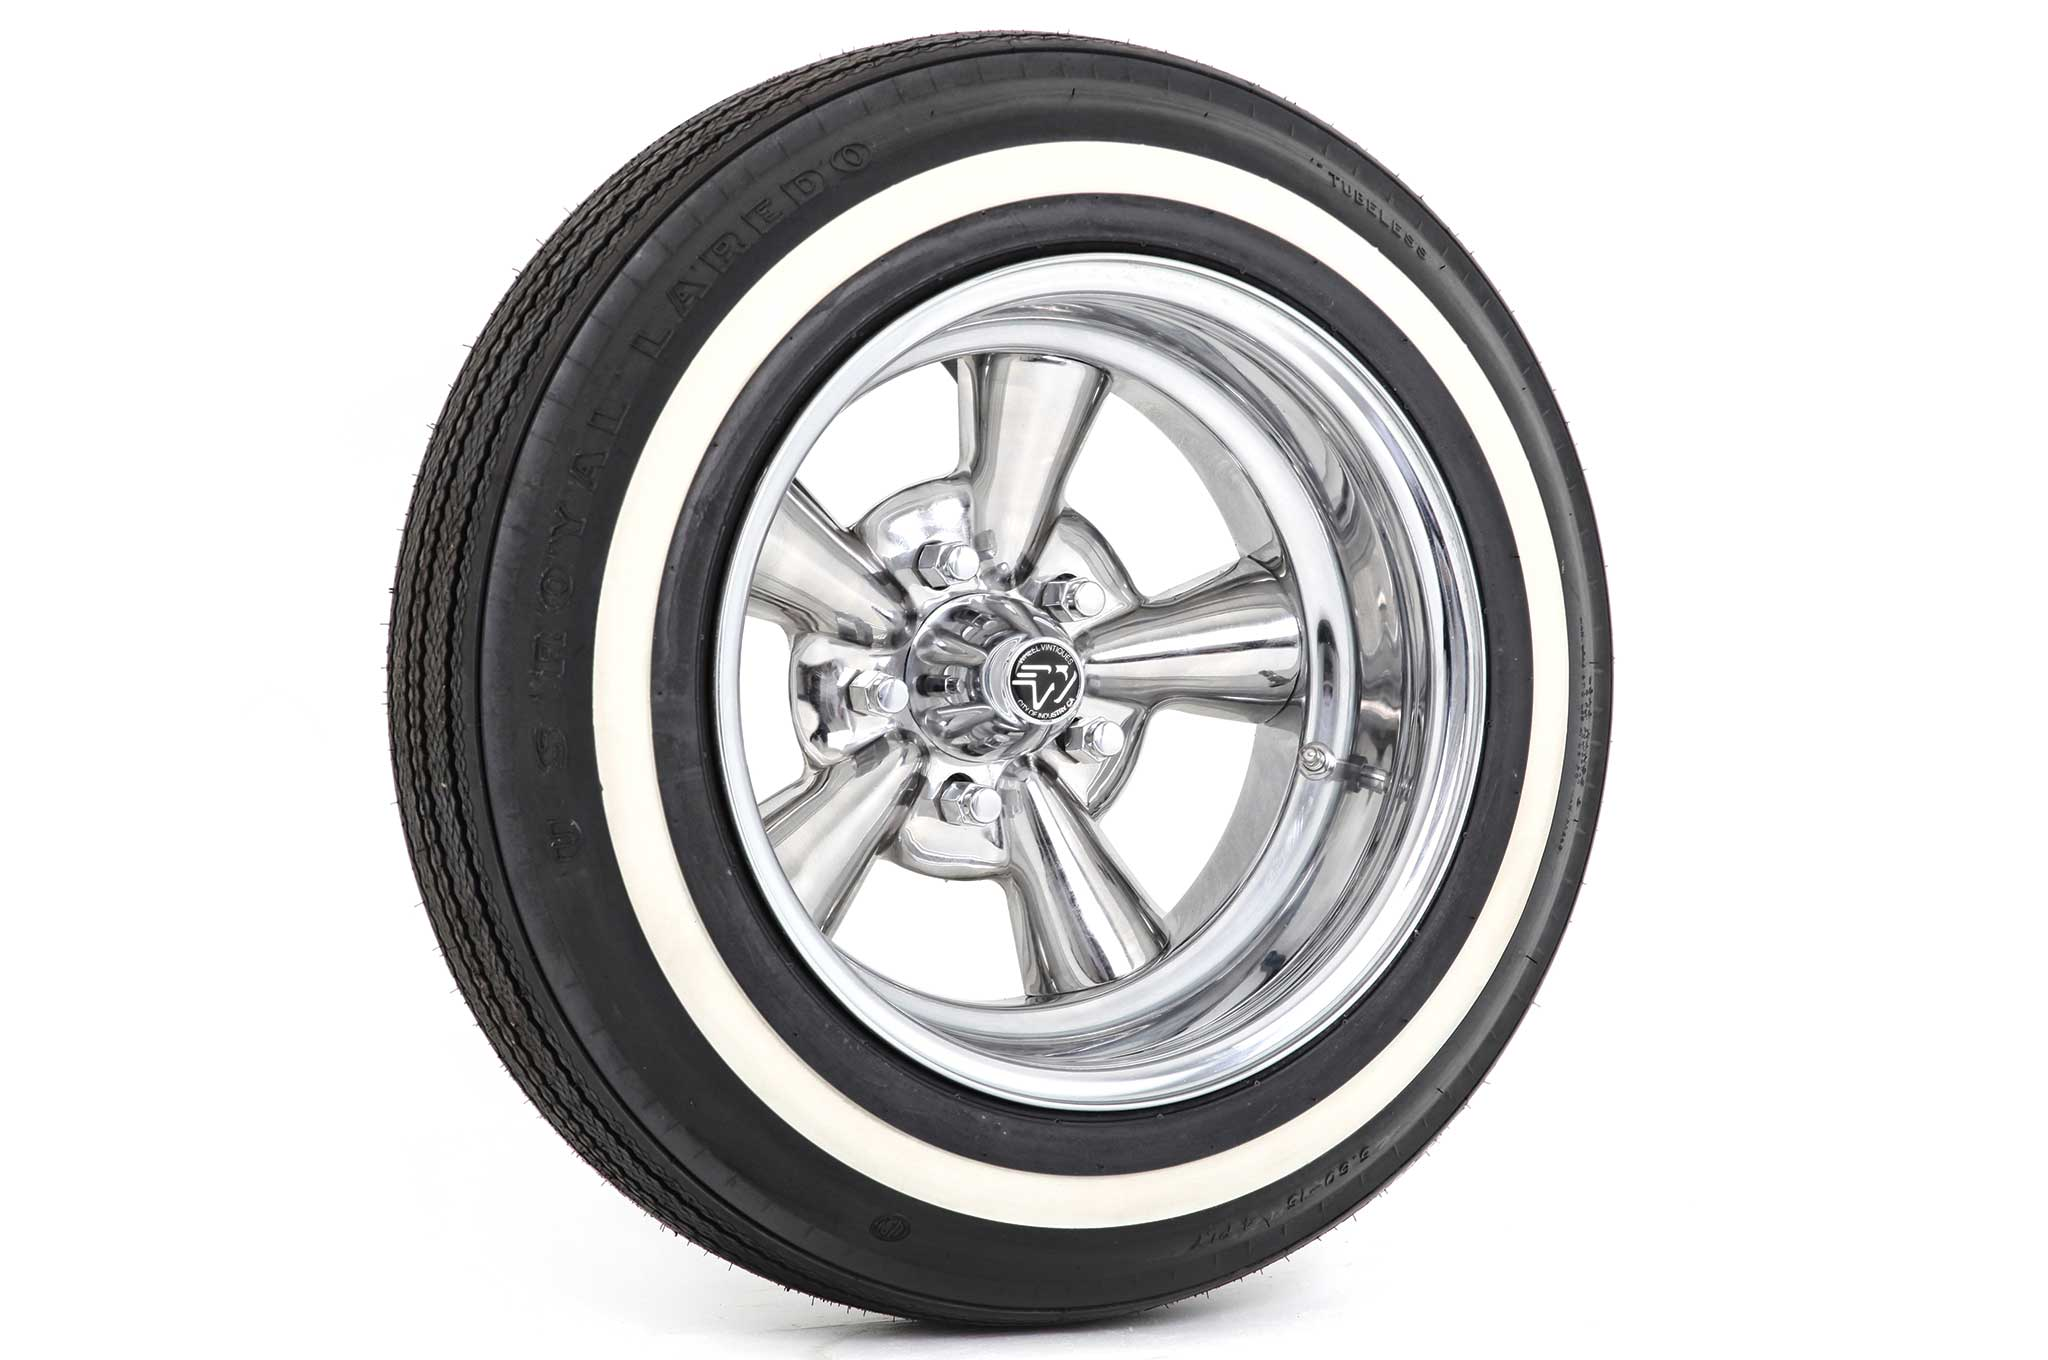 coker tires wheel vintiques wheels old school new school lowrider. Black Bedroom Furniture Sets. Home Design Ideas